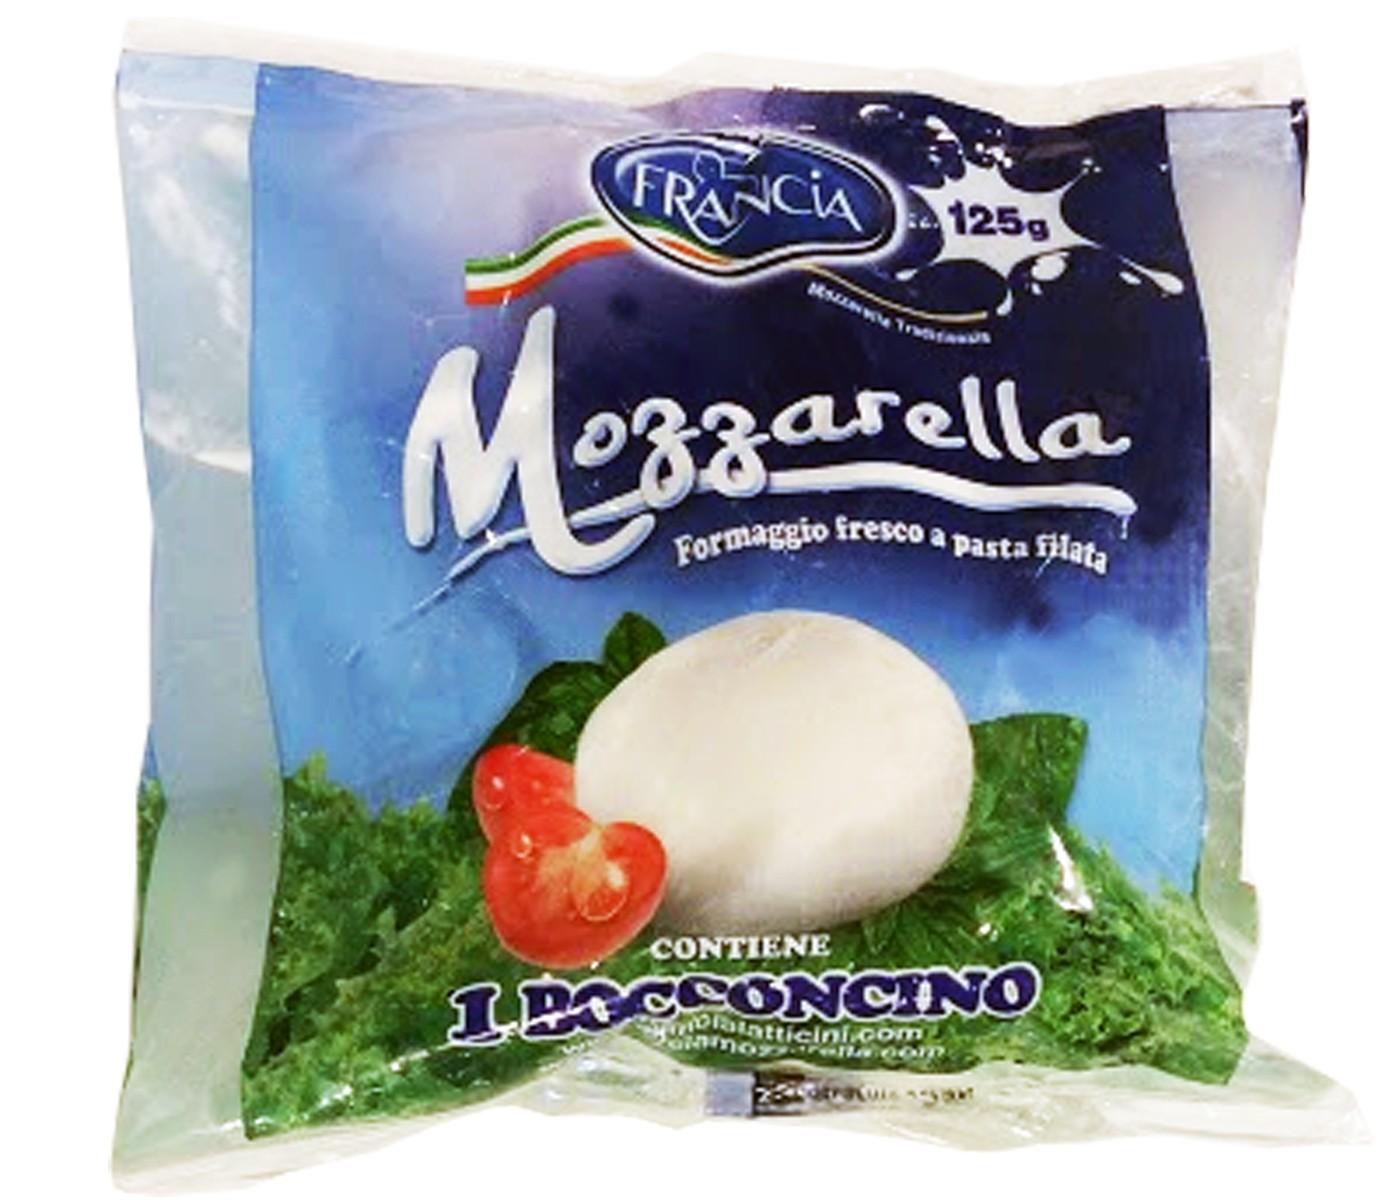 Сыр Mozzarella i Bocconcino Francia фото